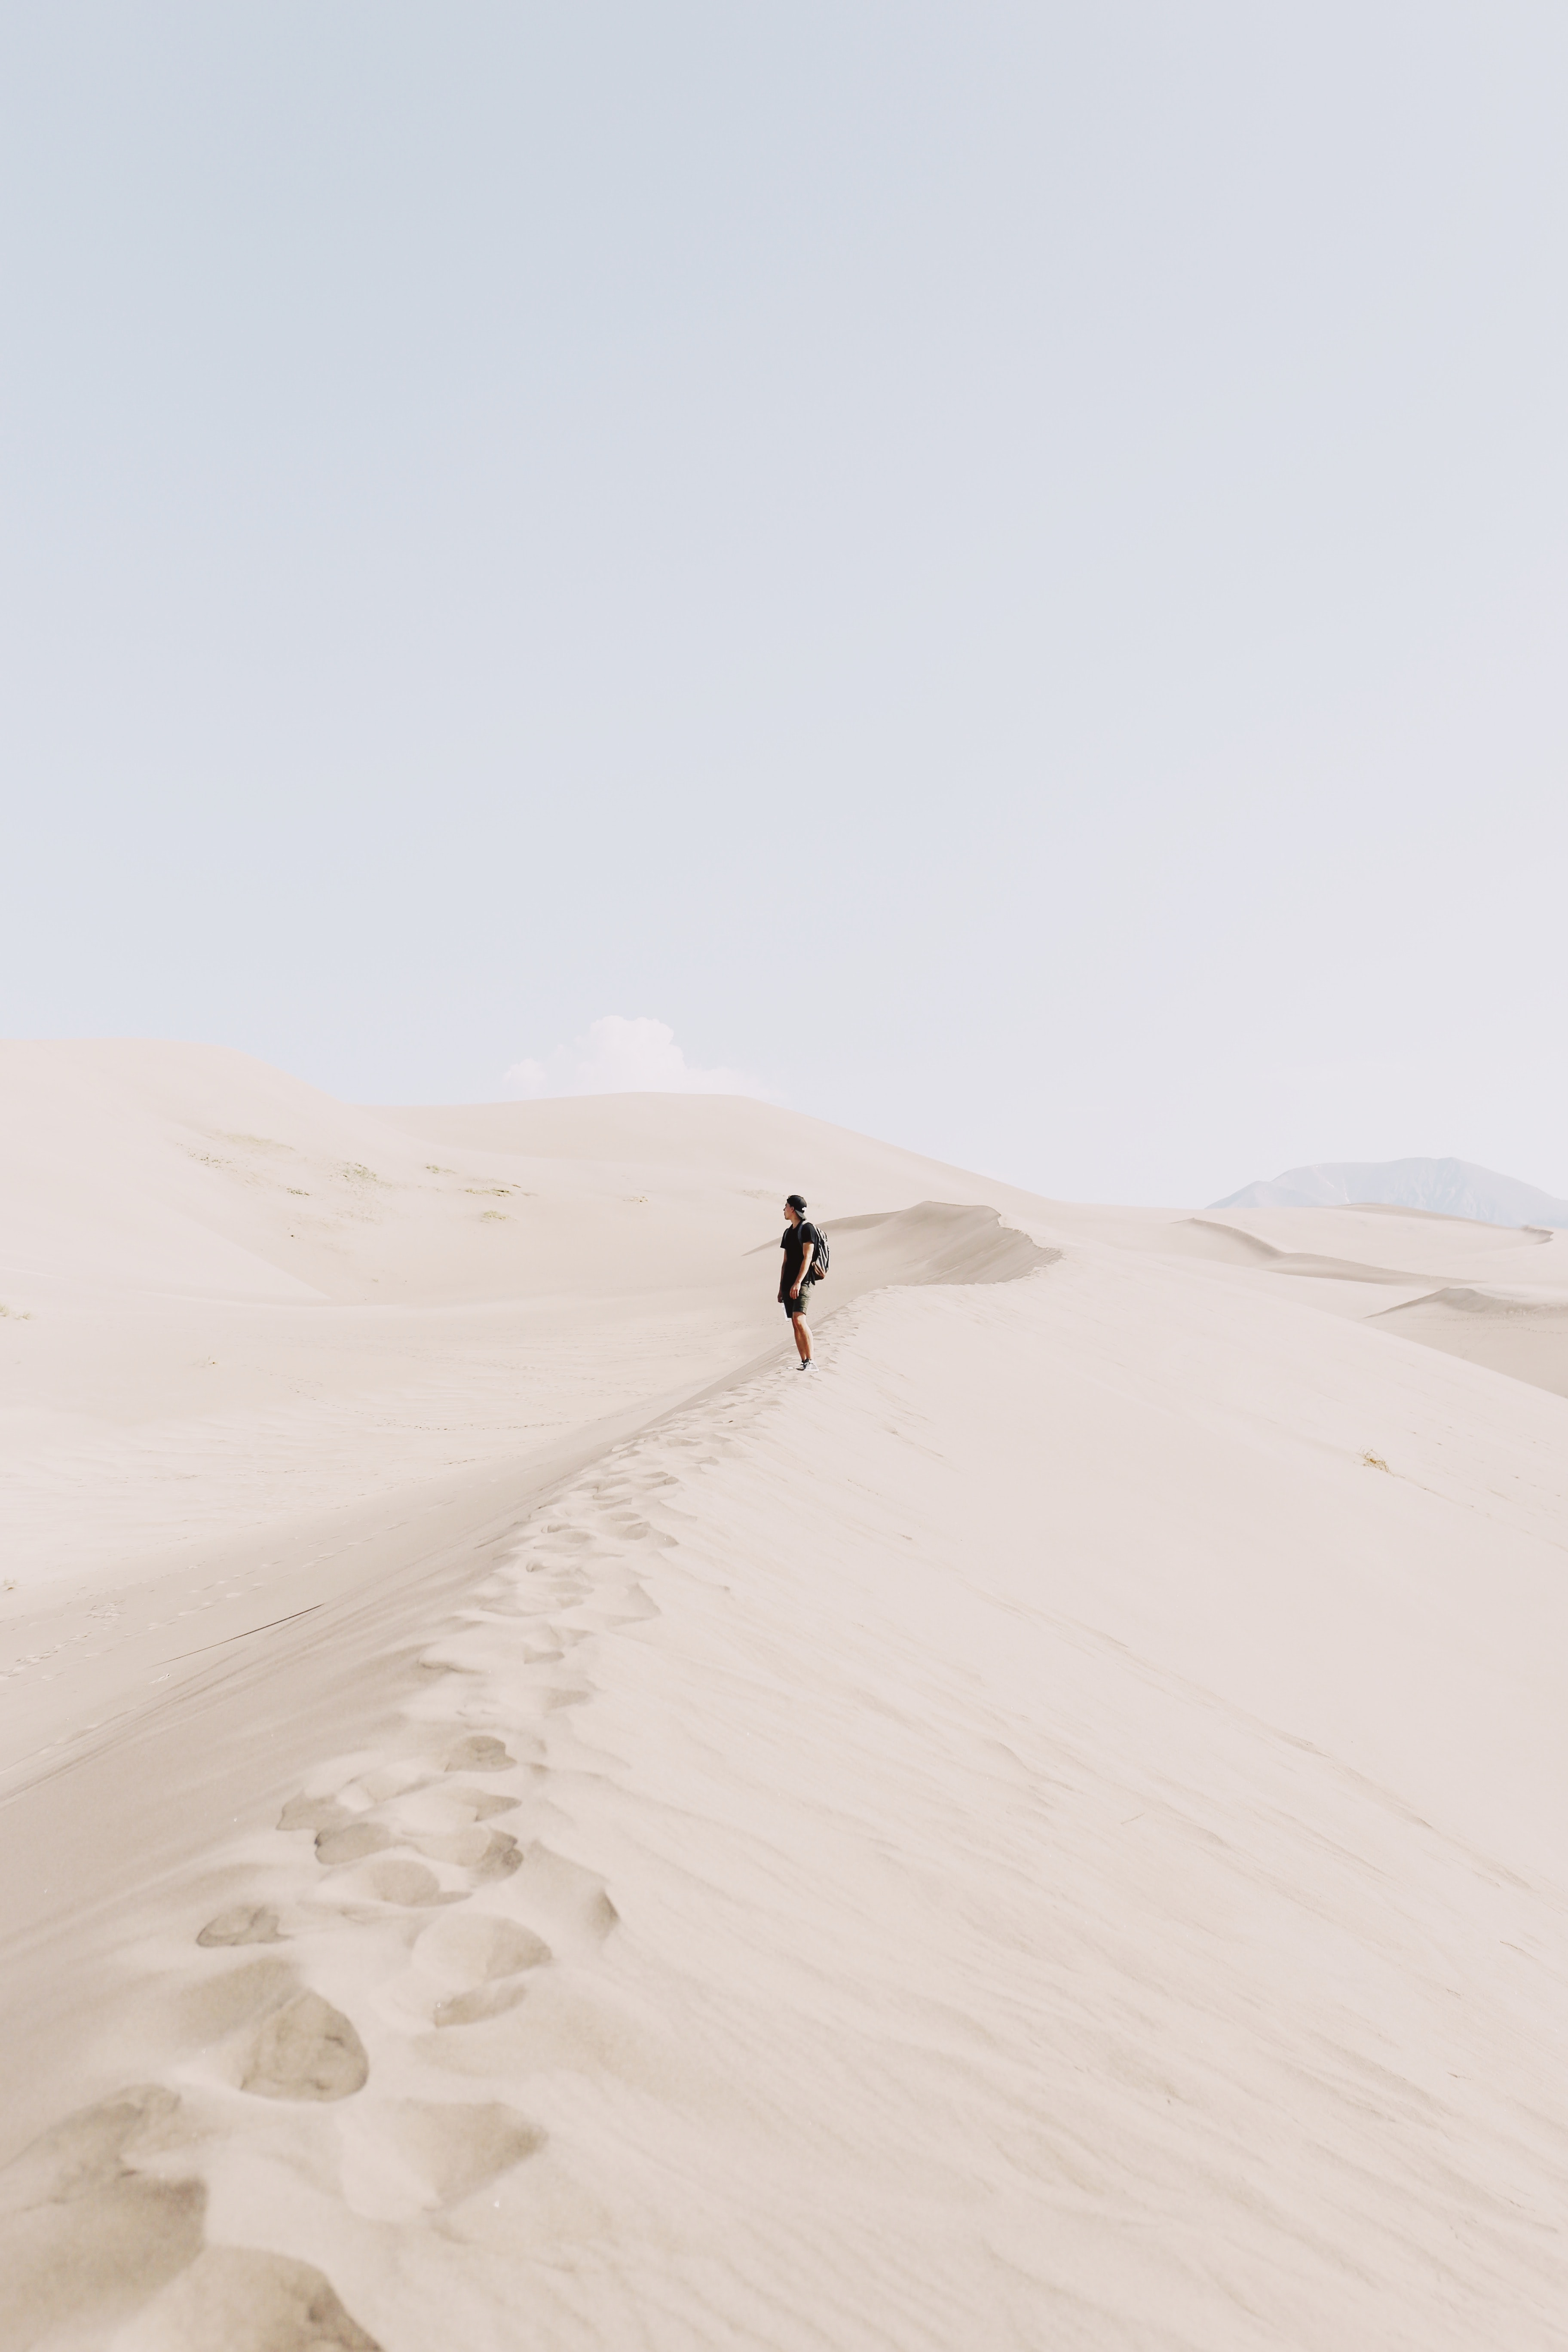 Dear Traveler... journey stories